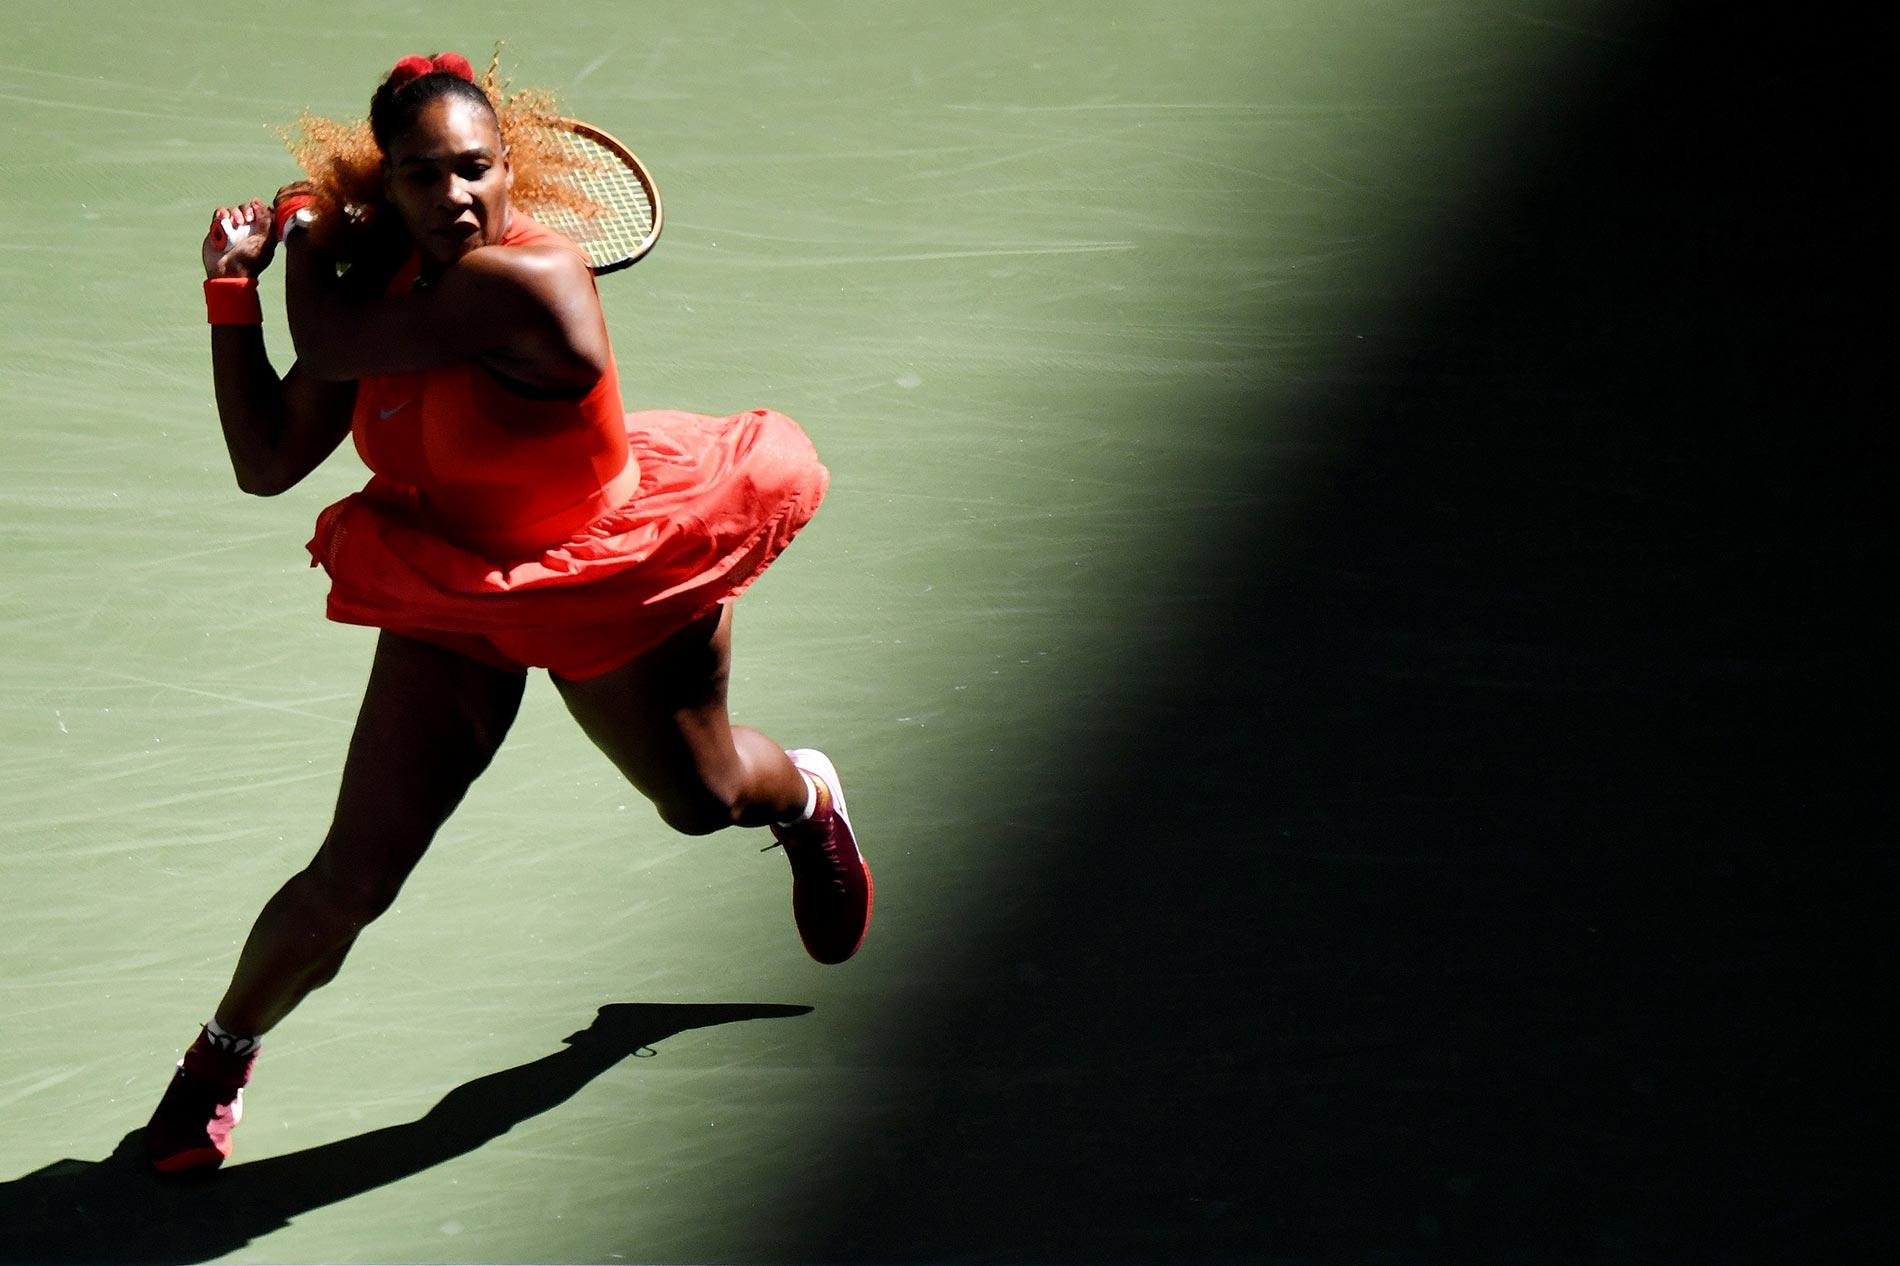 Serena Williams at 2020 US Open